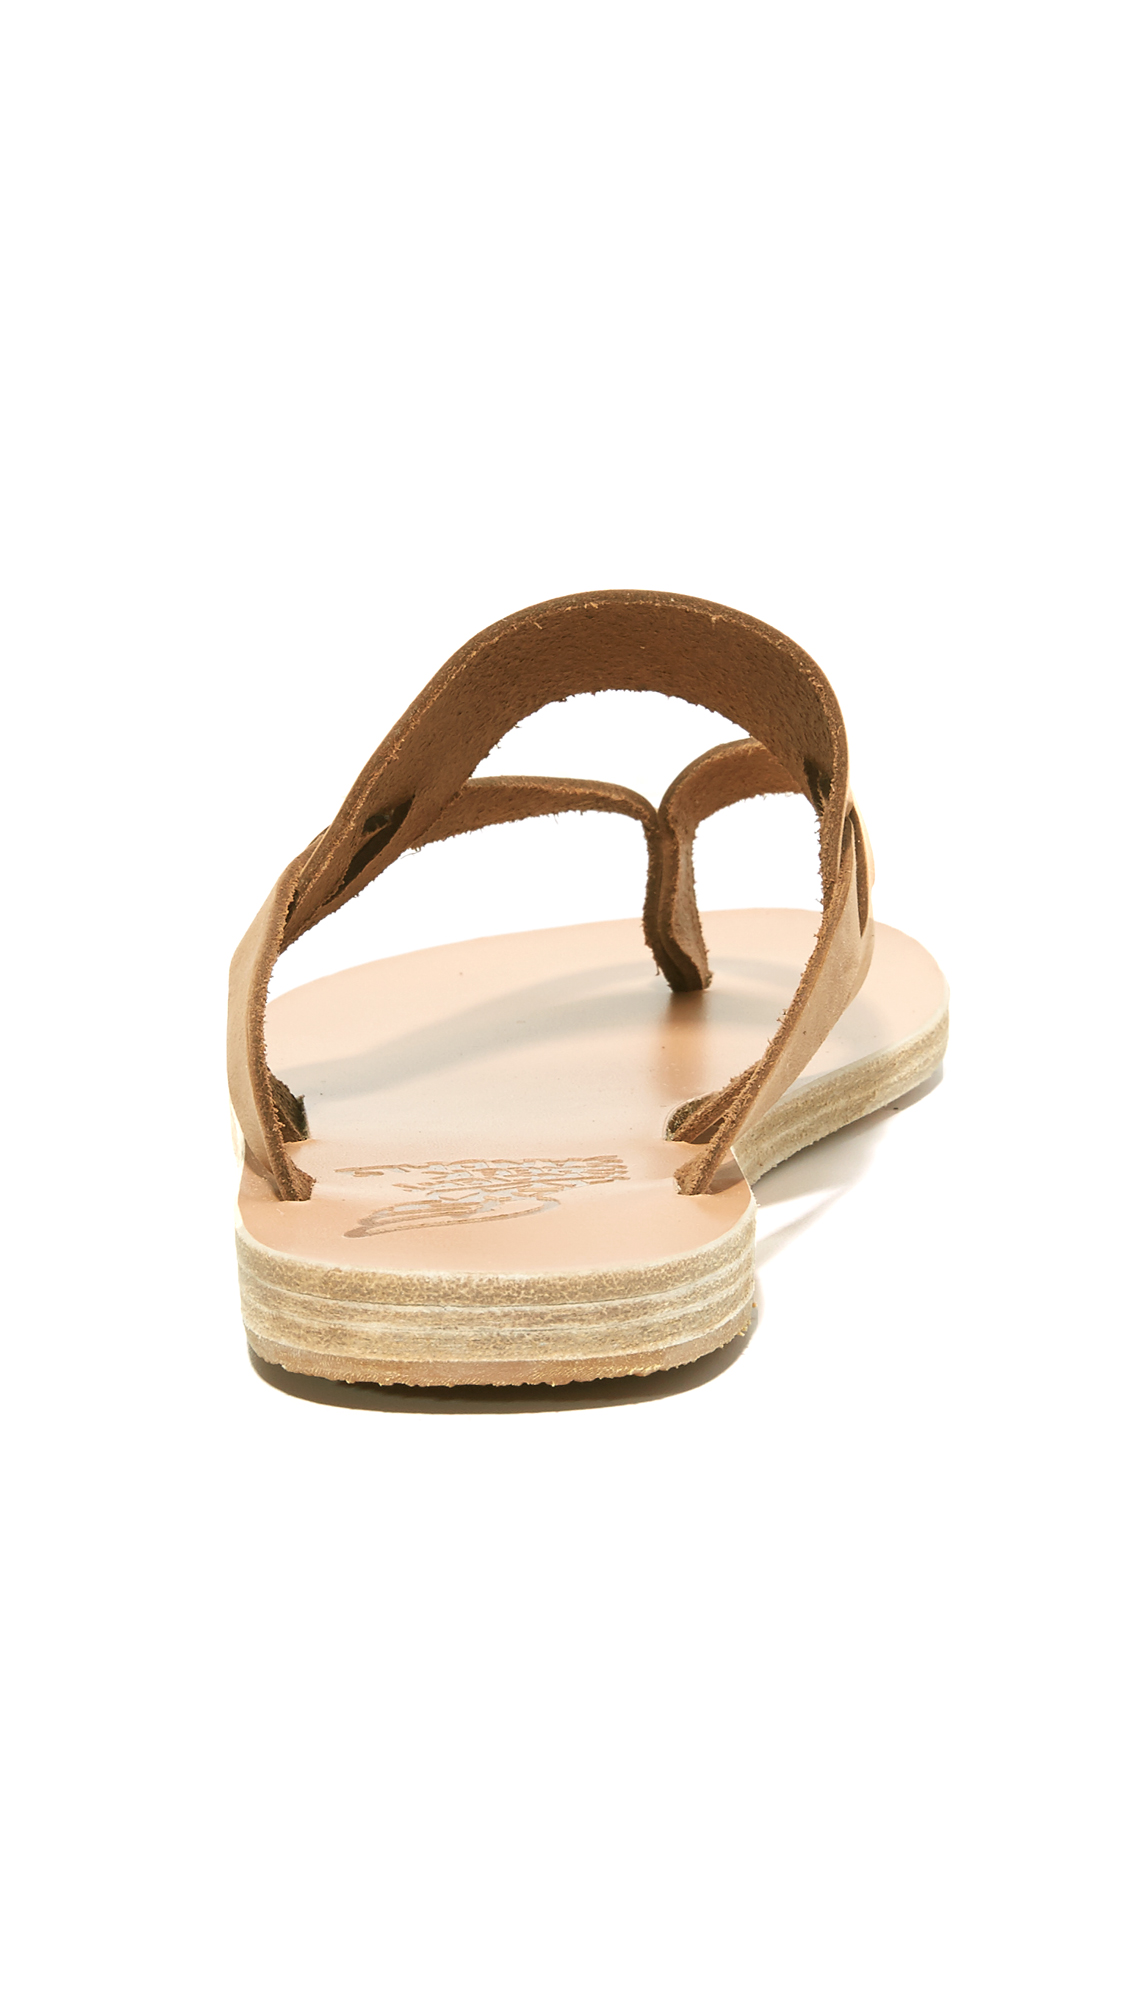 32c065f6c2bd5 Ancient Greek Sandals Zenobia Thong Sandals